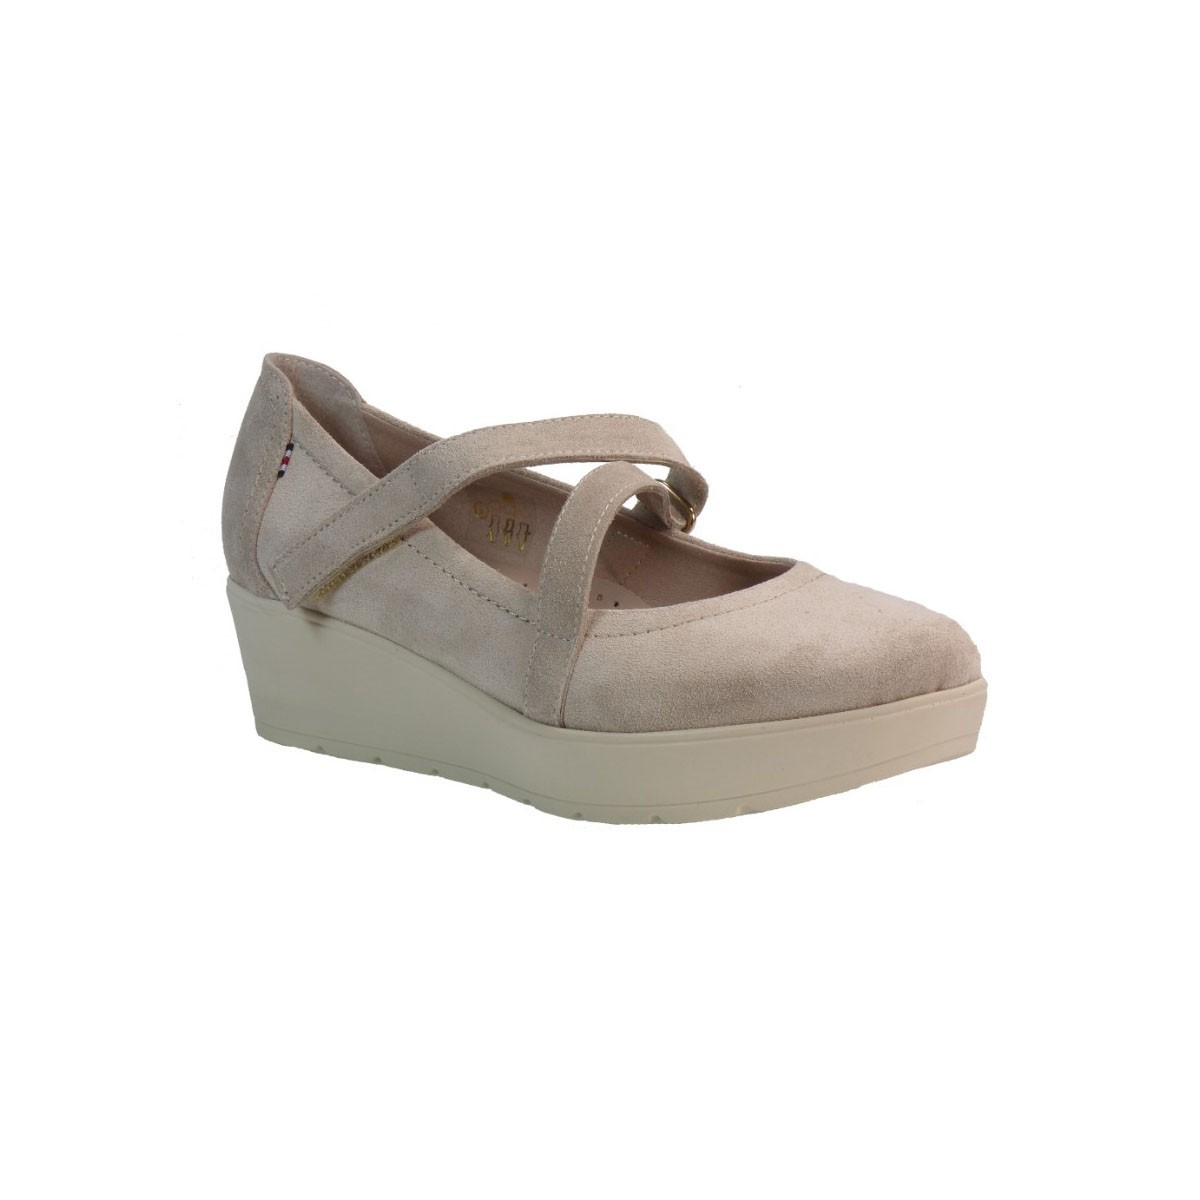 Envie Shoes Γυναικεία Παπούτσια Πλατφόρμα Ε02-05043 Μπεζ Envie Shoes Ε02-05043 Μπεζ